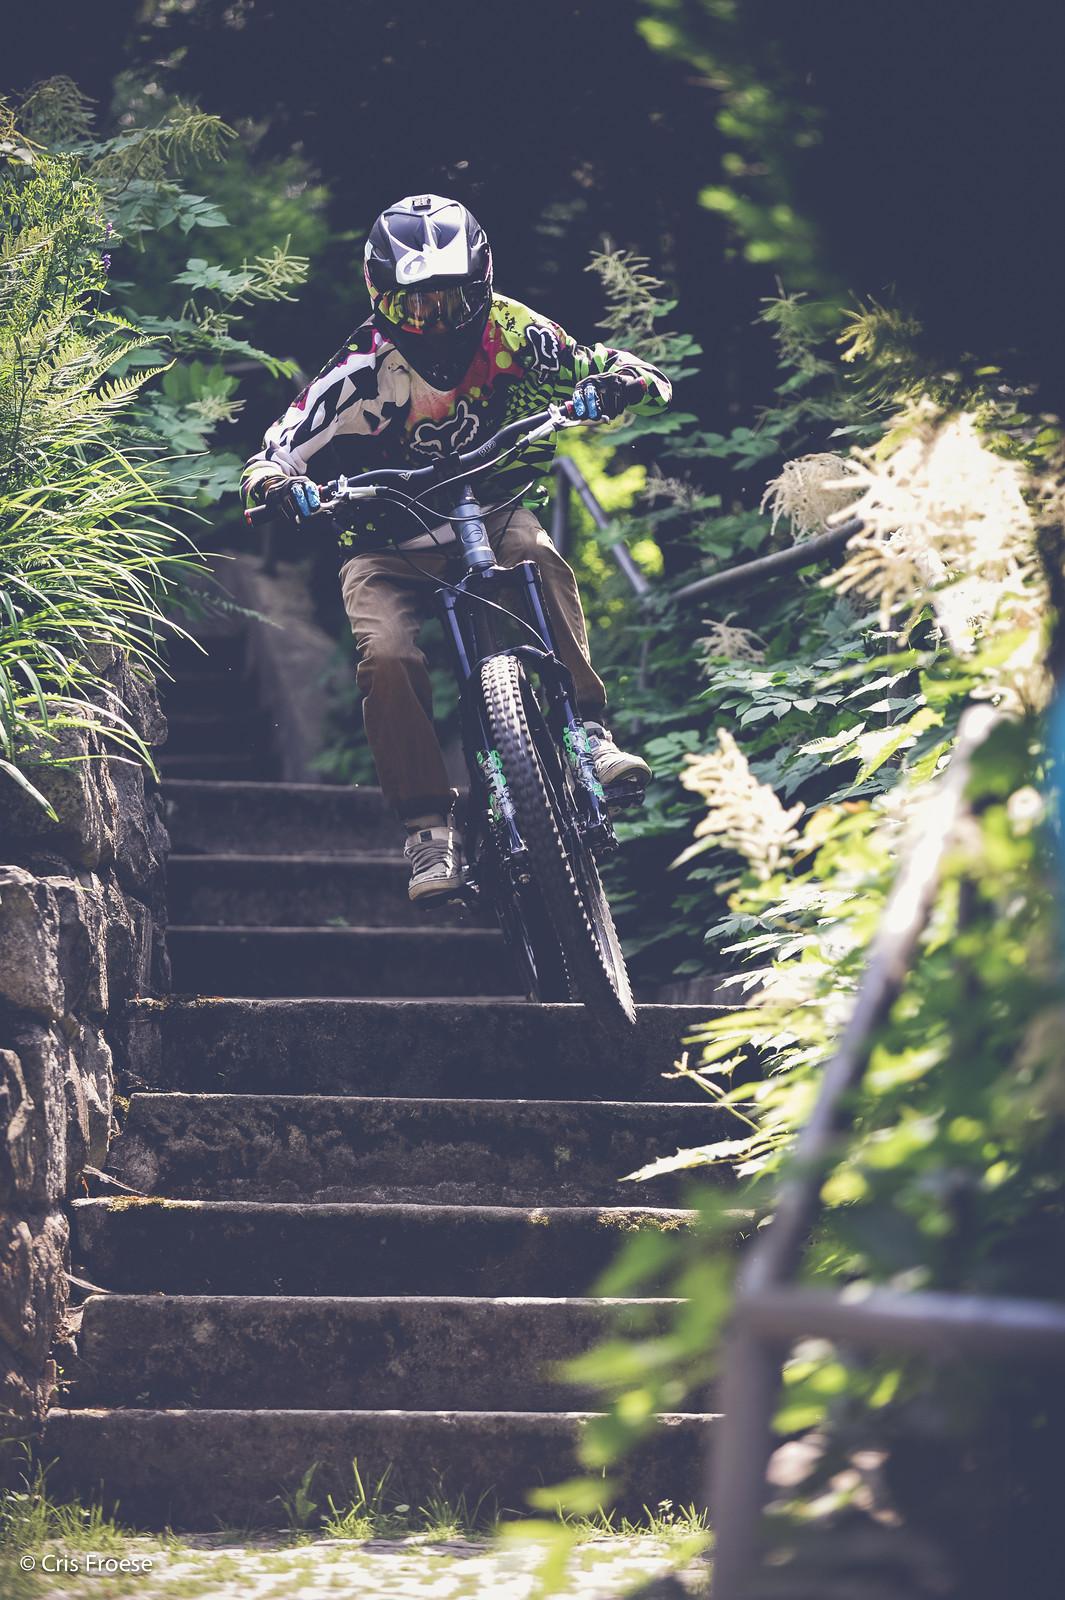 qra splash-14 - MouflonsRiders - Mountain Biking Pictures - Vital MTB